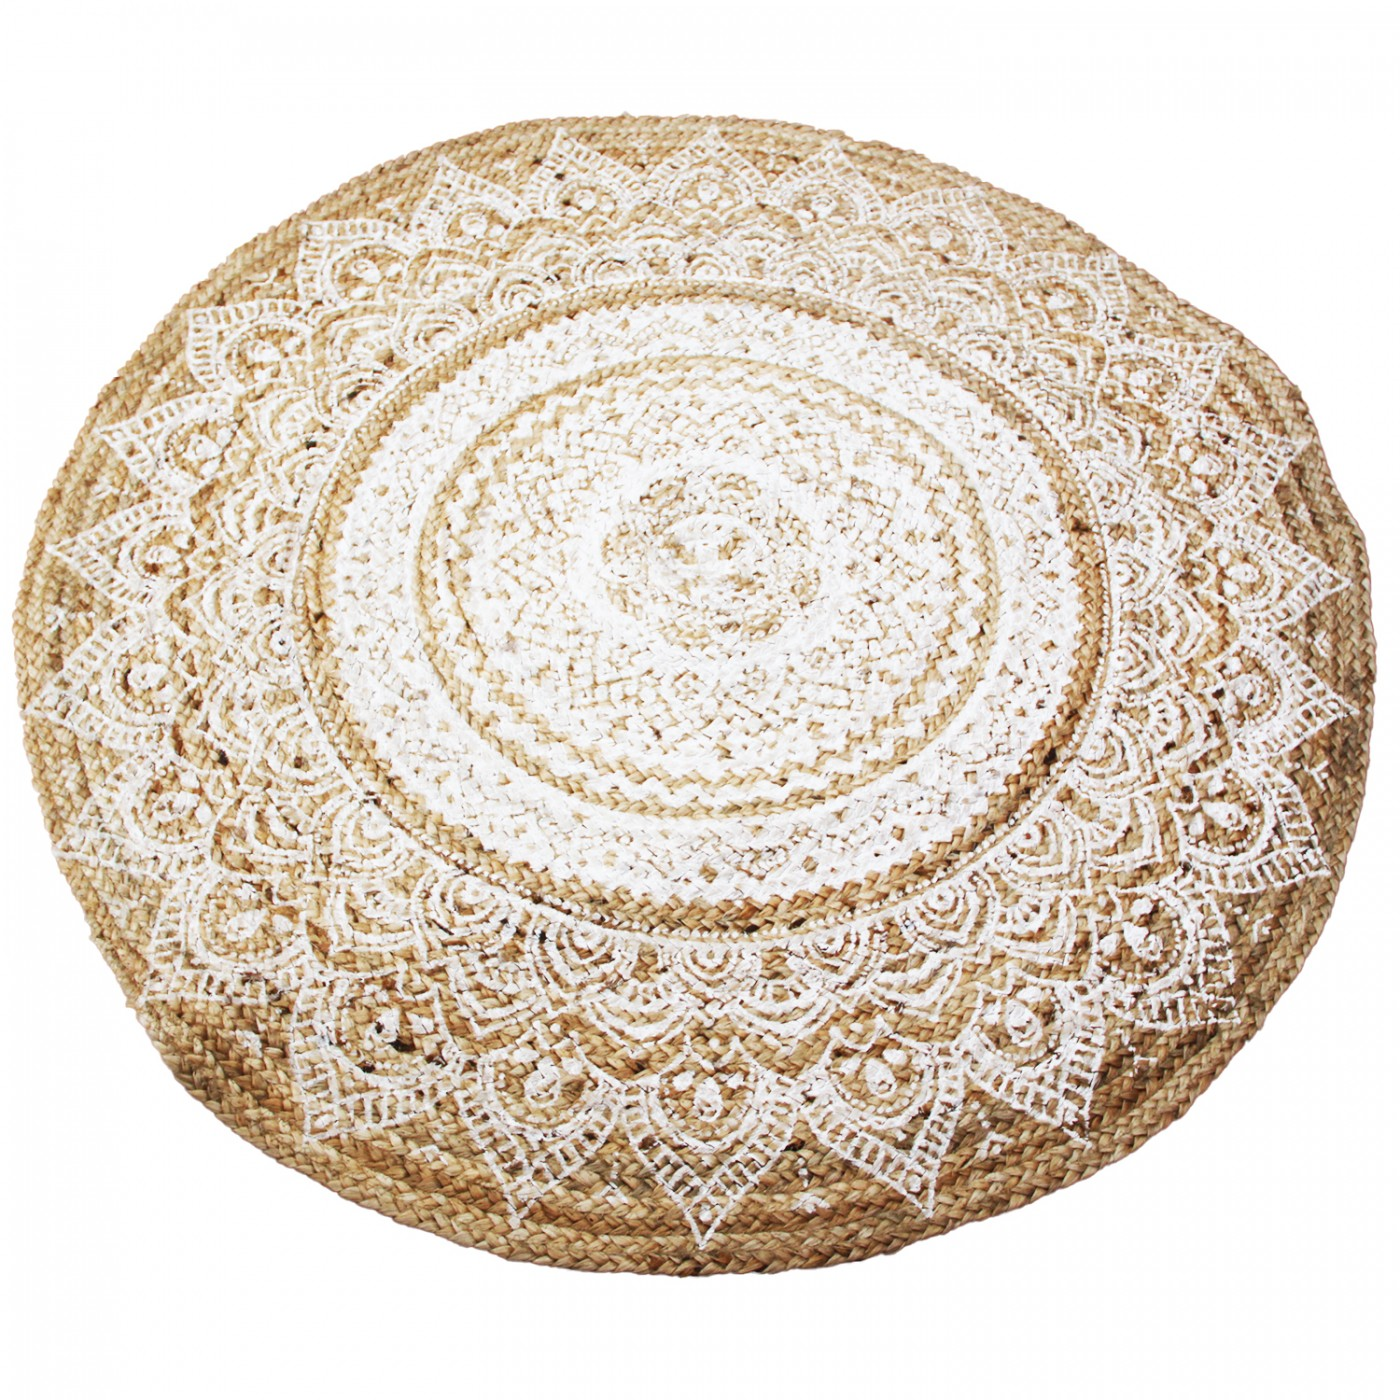 Dywan z juty jutowy okrągły dwustronny wzór